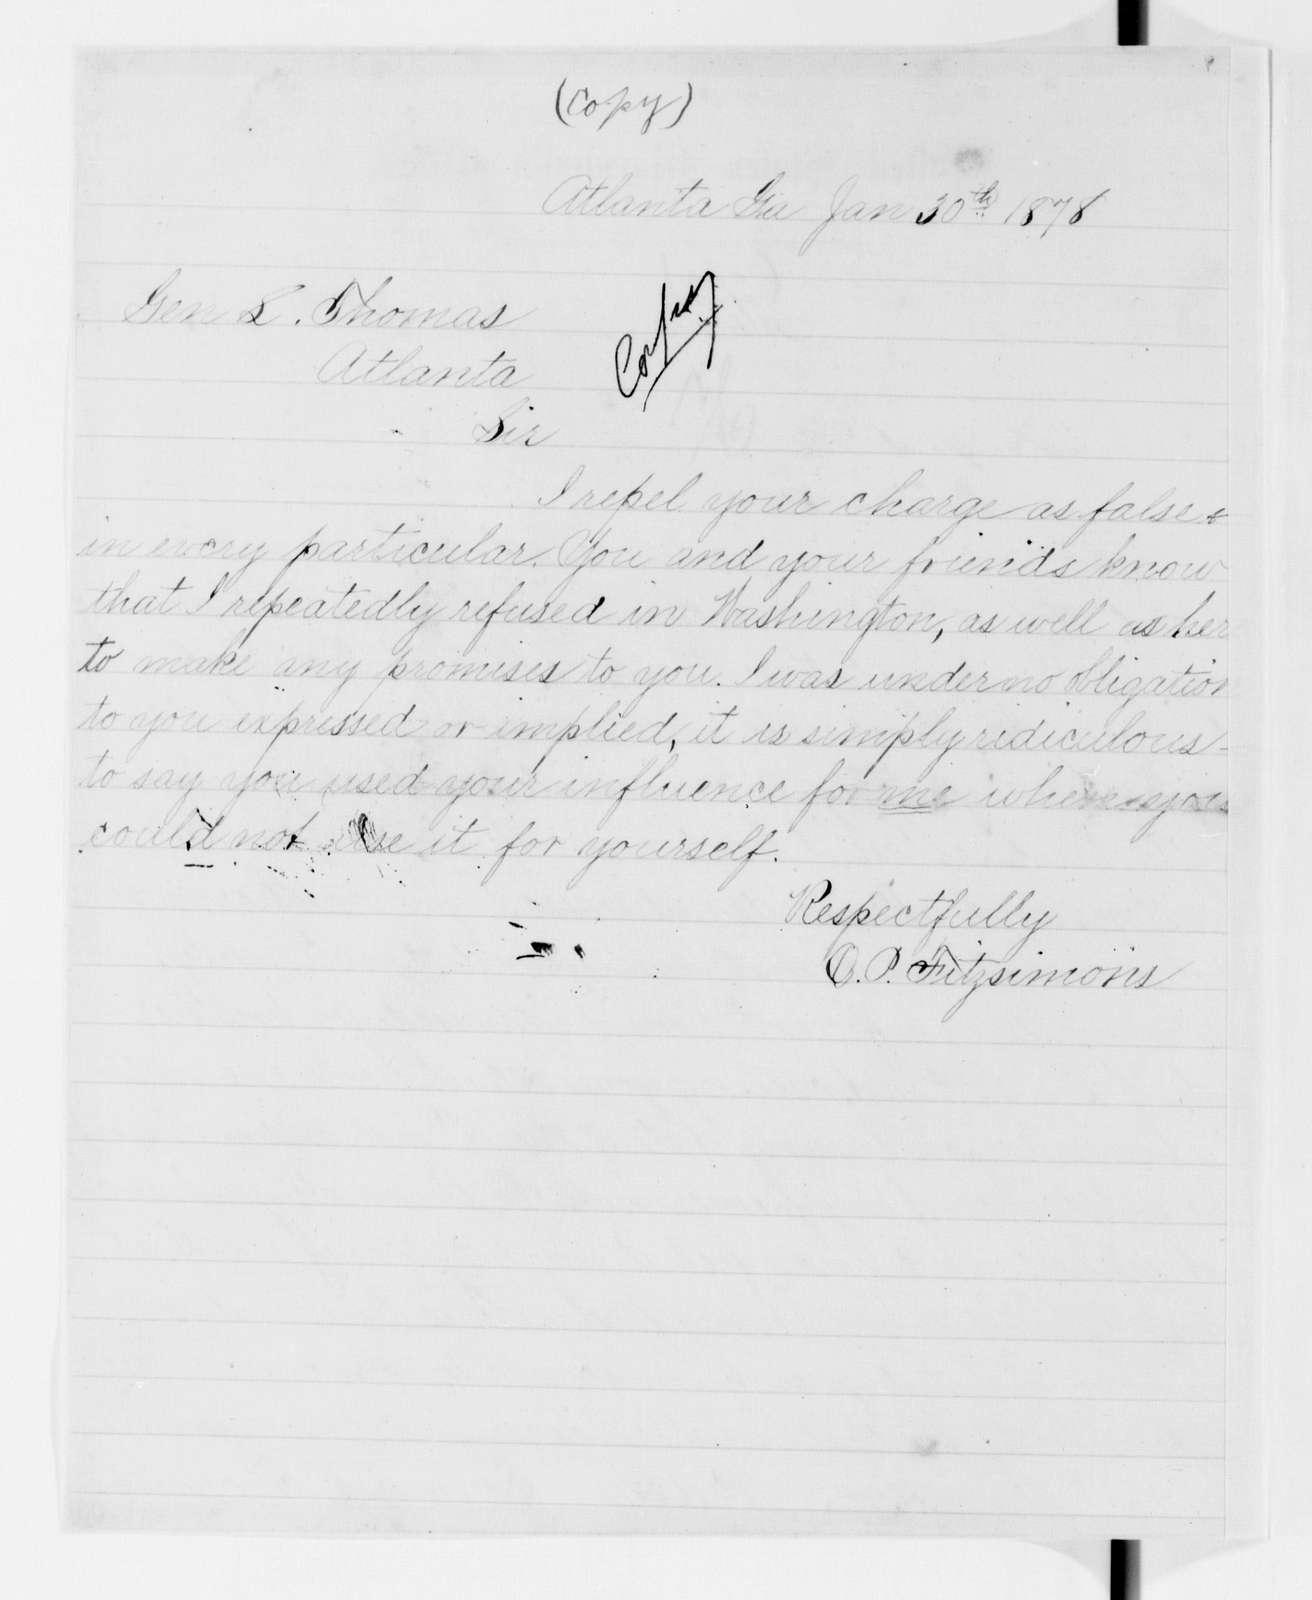 Alexander Hamilton Stephens Papers: General Correspondence, 1784-1886; 1877, Oct. 5-1878, June 10